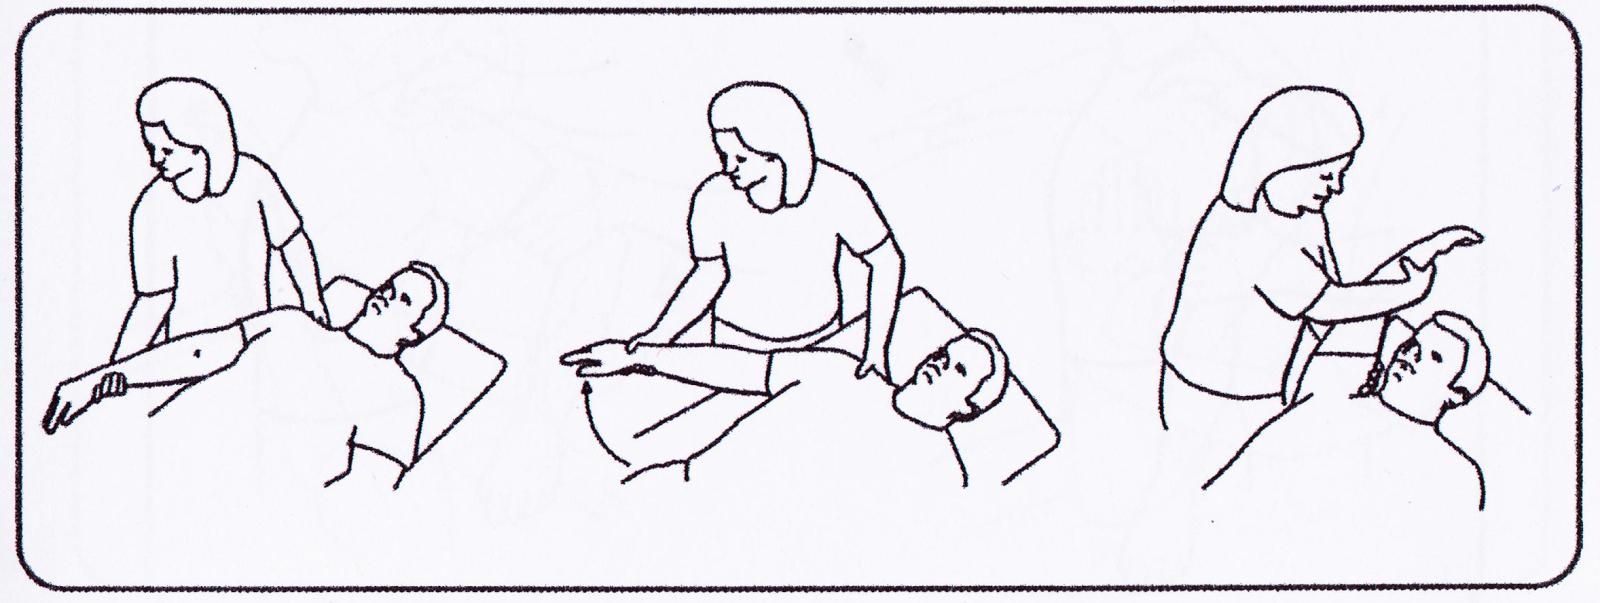 HelioSpectrum: Program of 9 passive exercises for upper